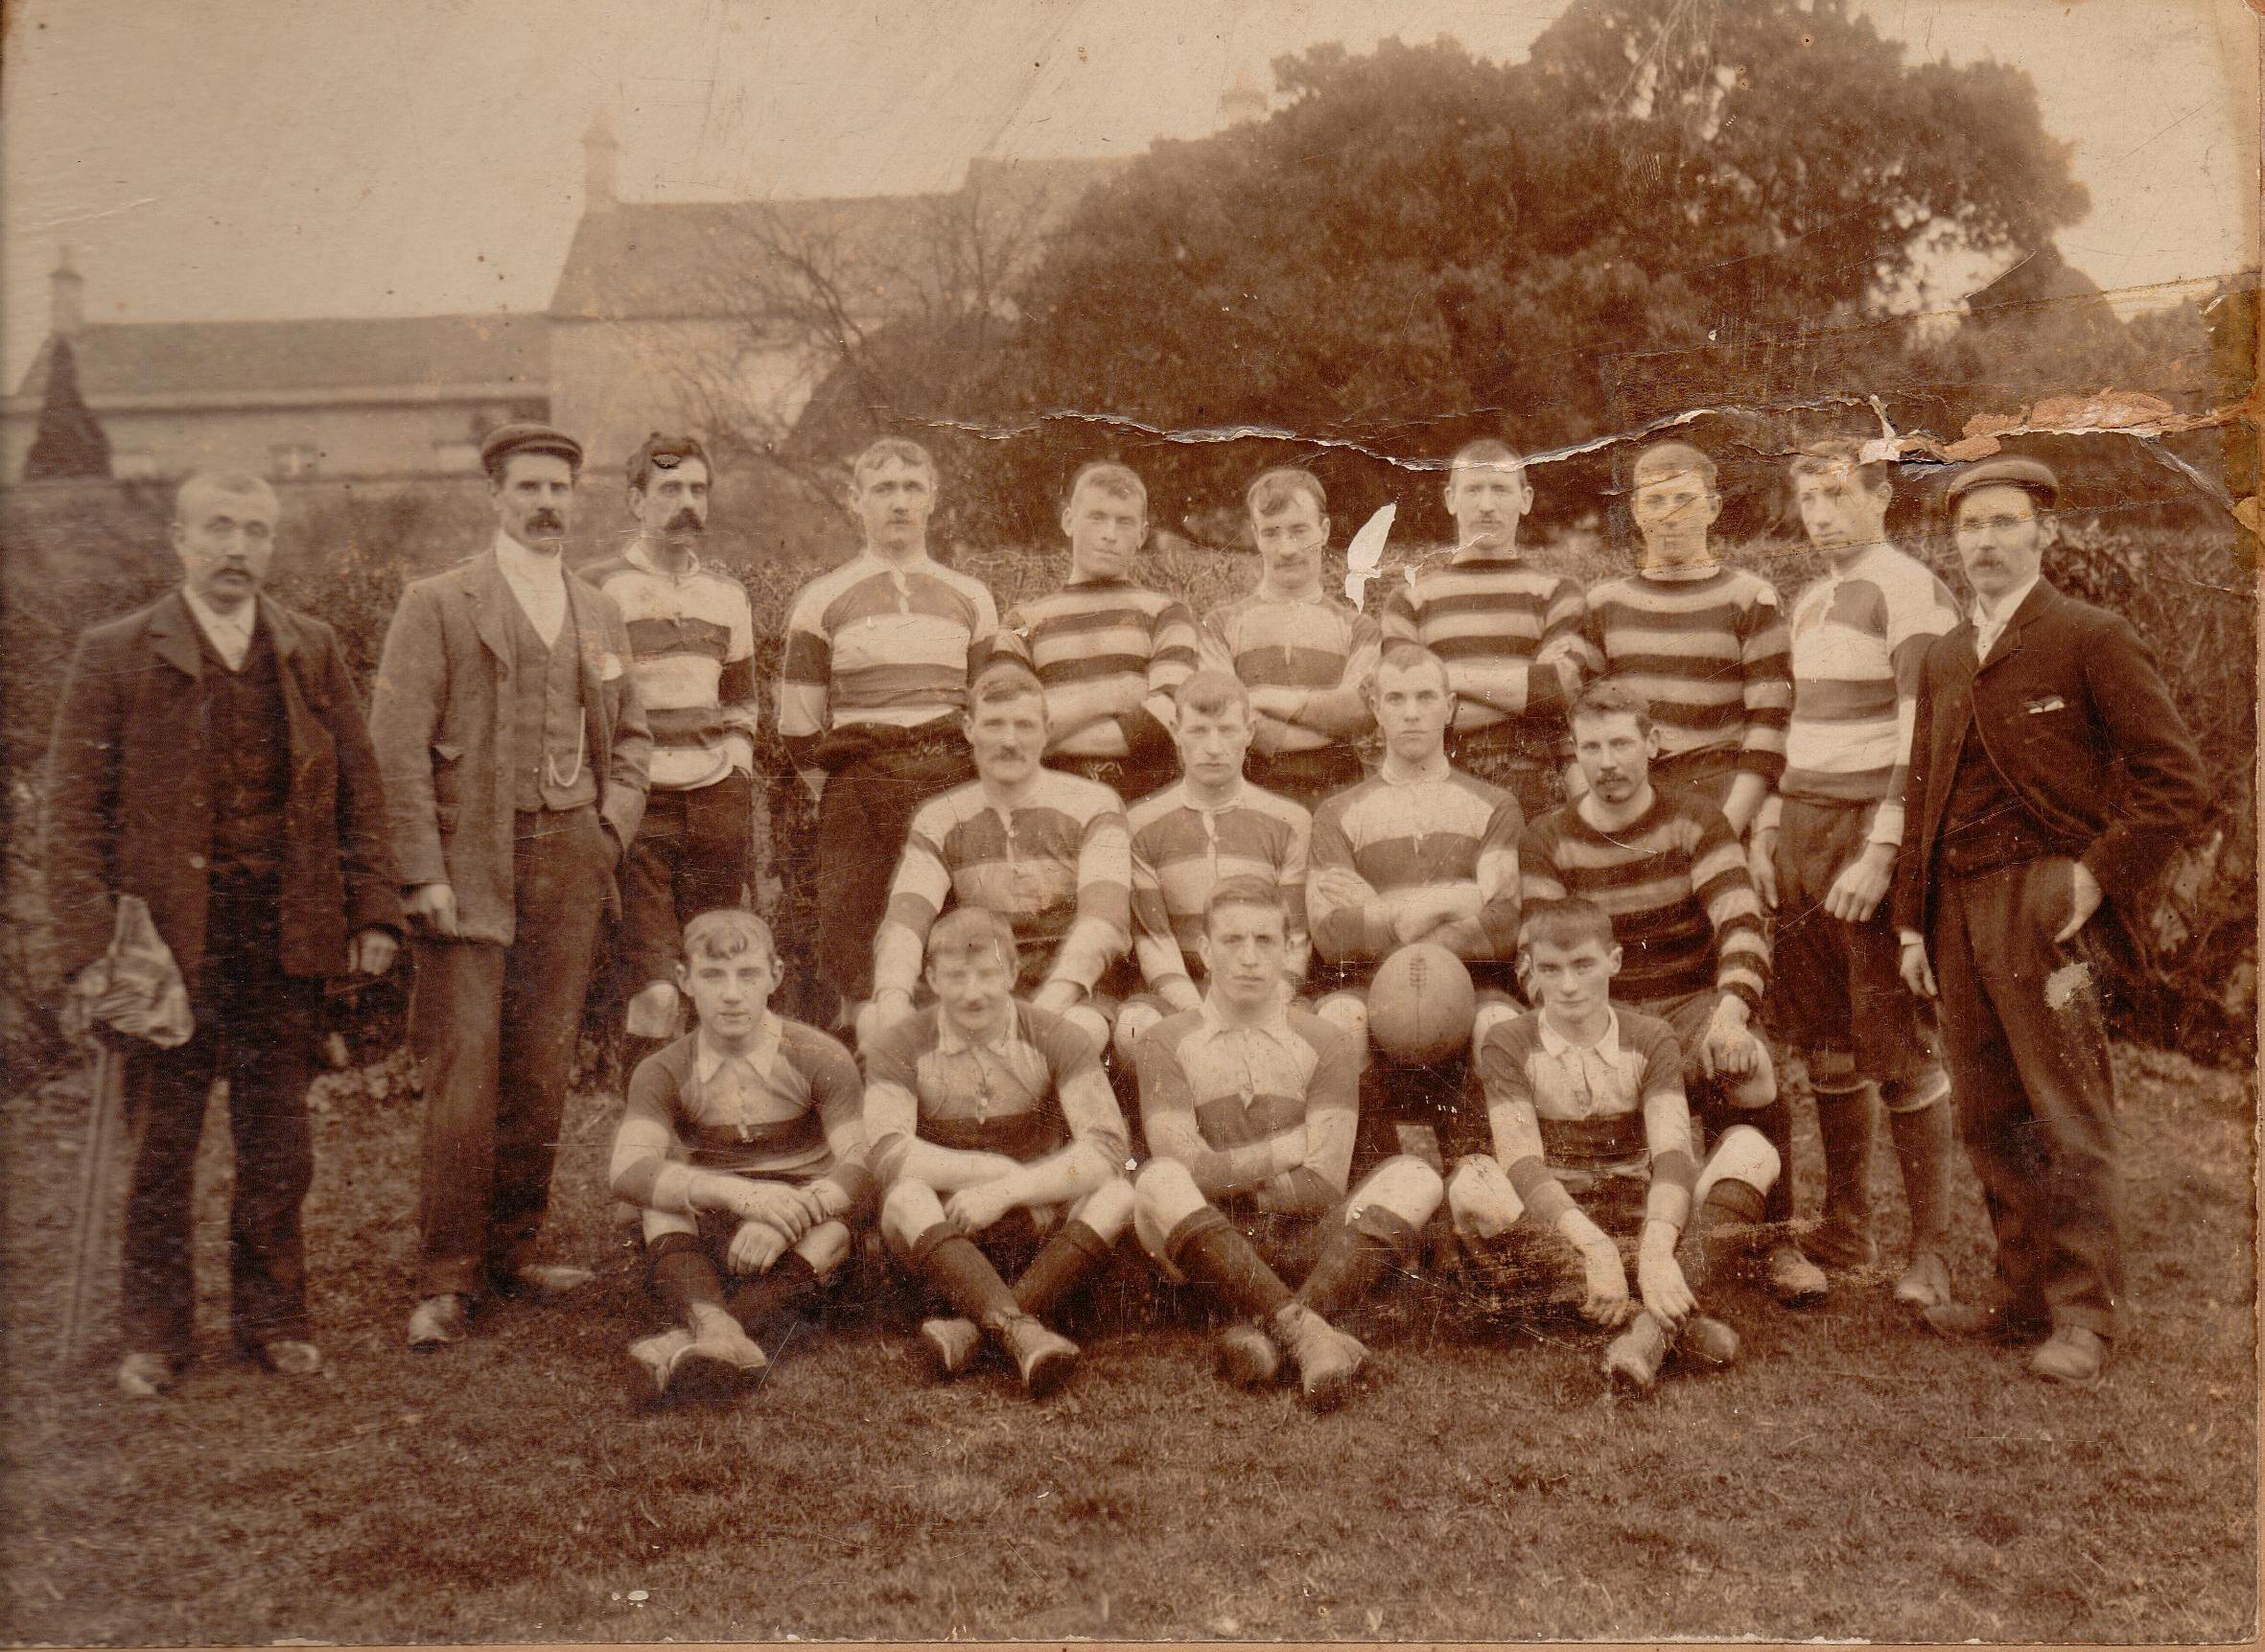 Painswick RFC - 1908-1909 1st XV